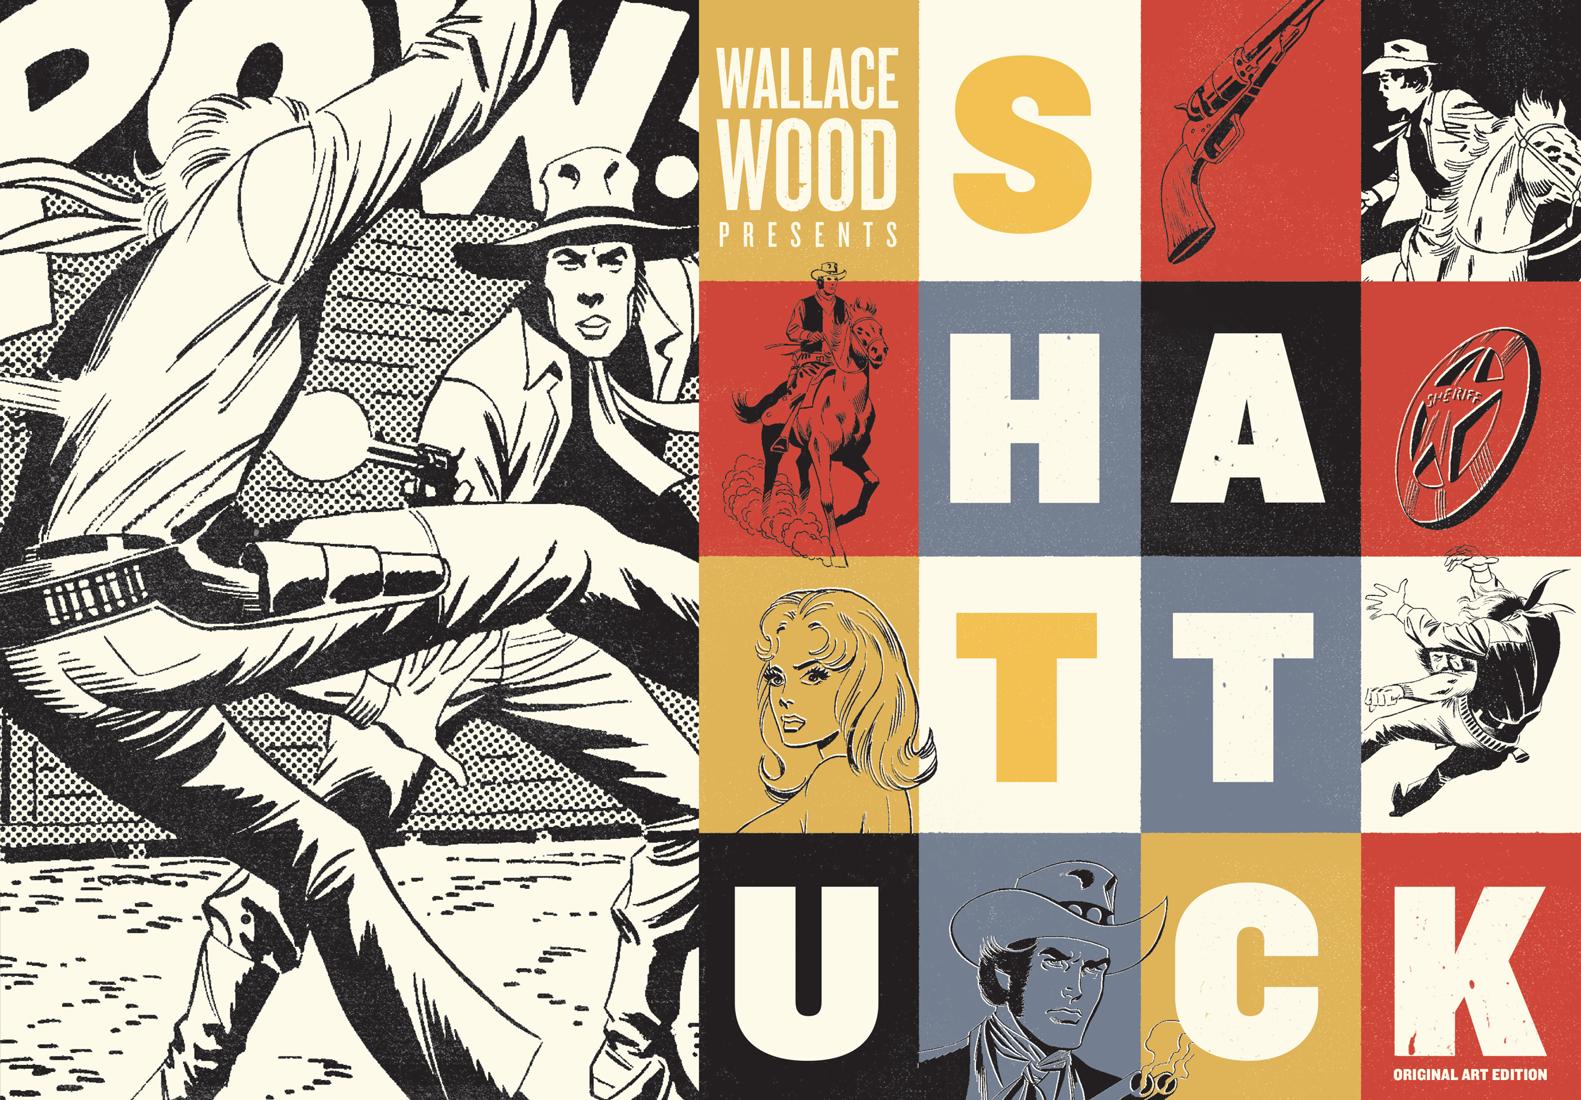 Review | Wallace Wood Presents Shattuck Original Art Edition